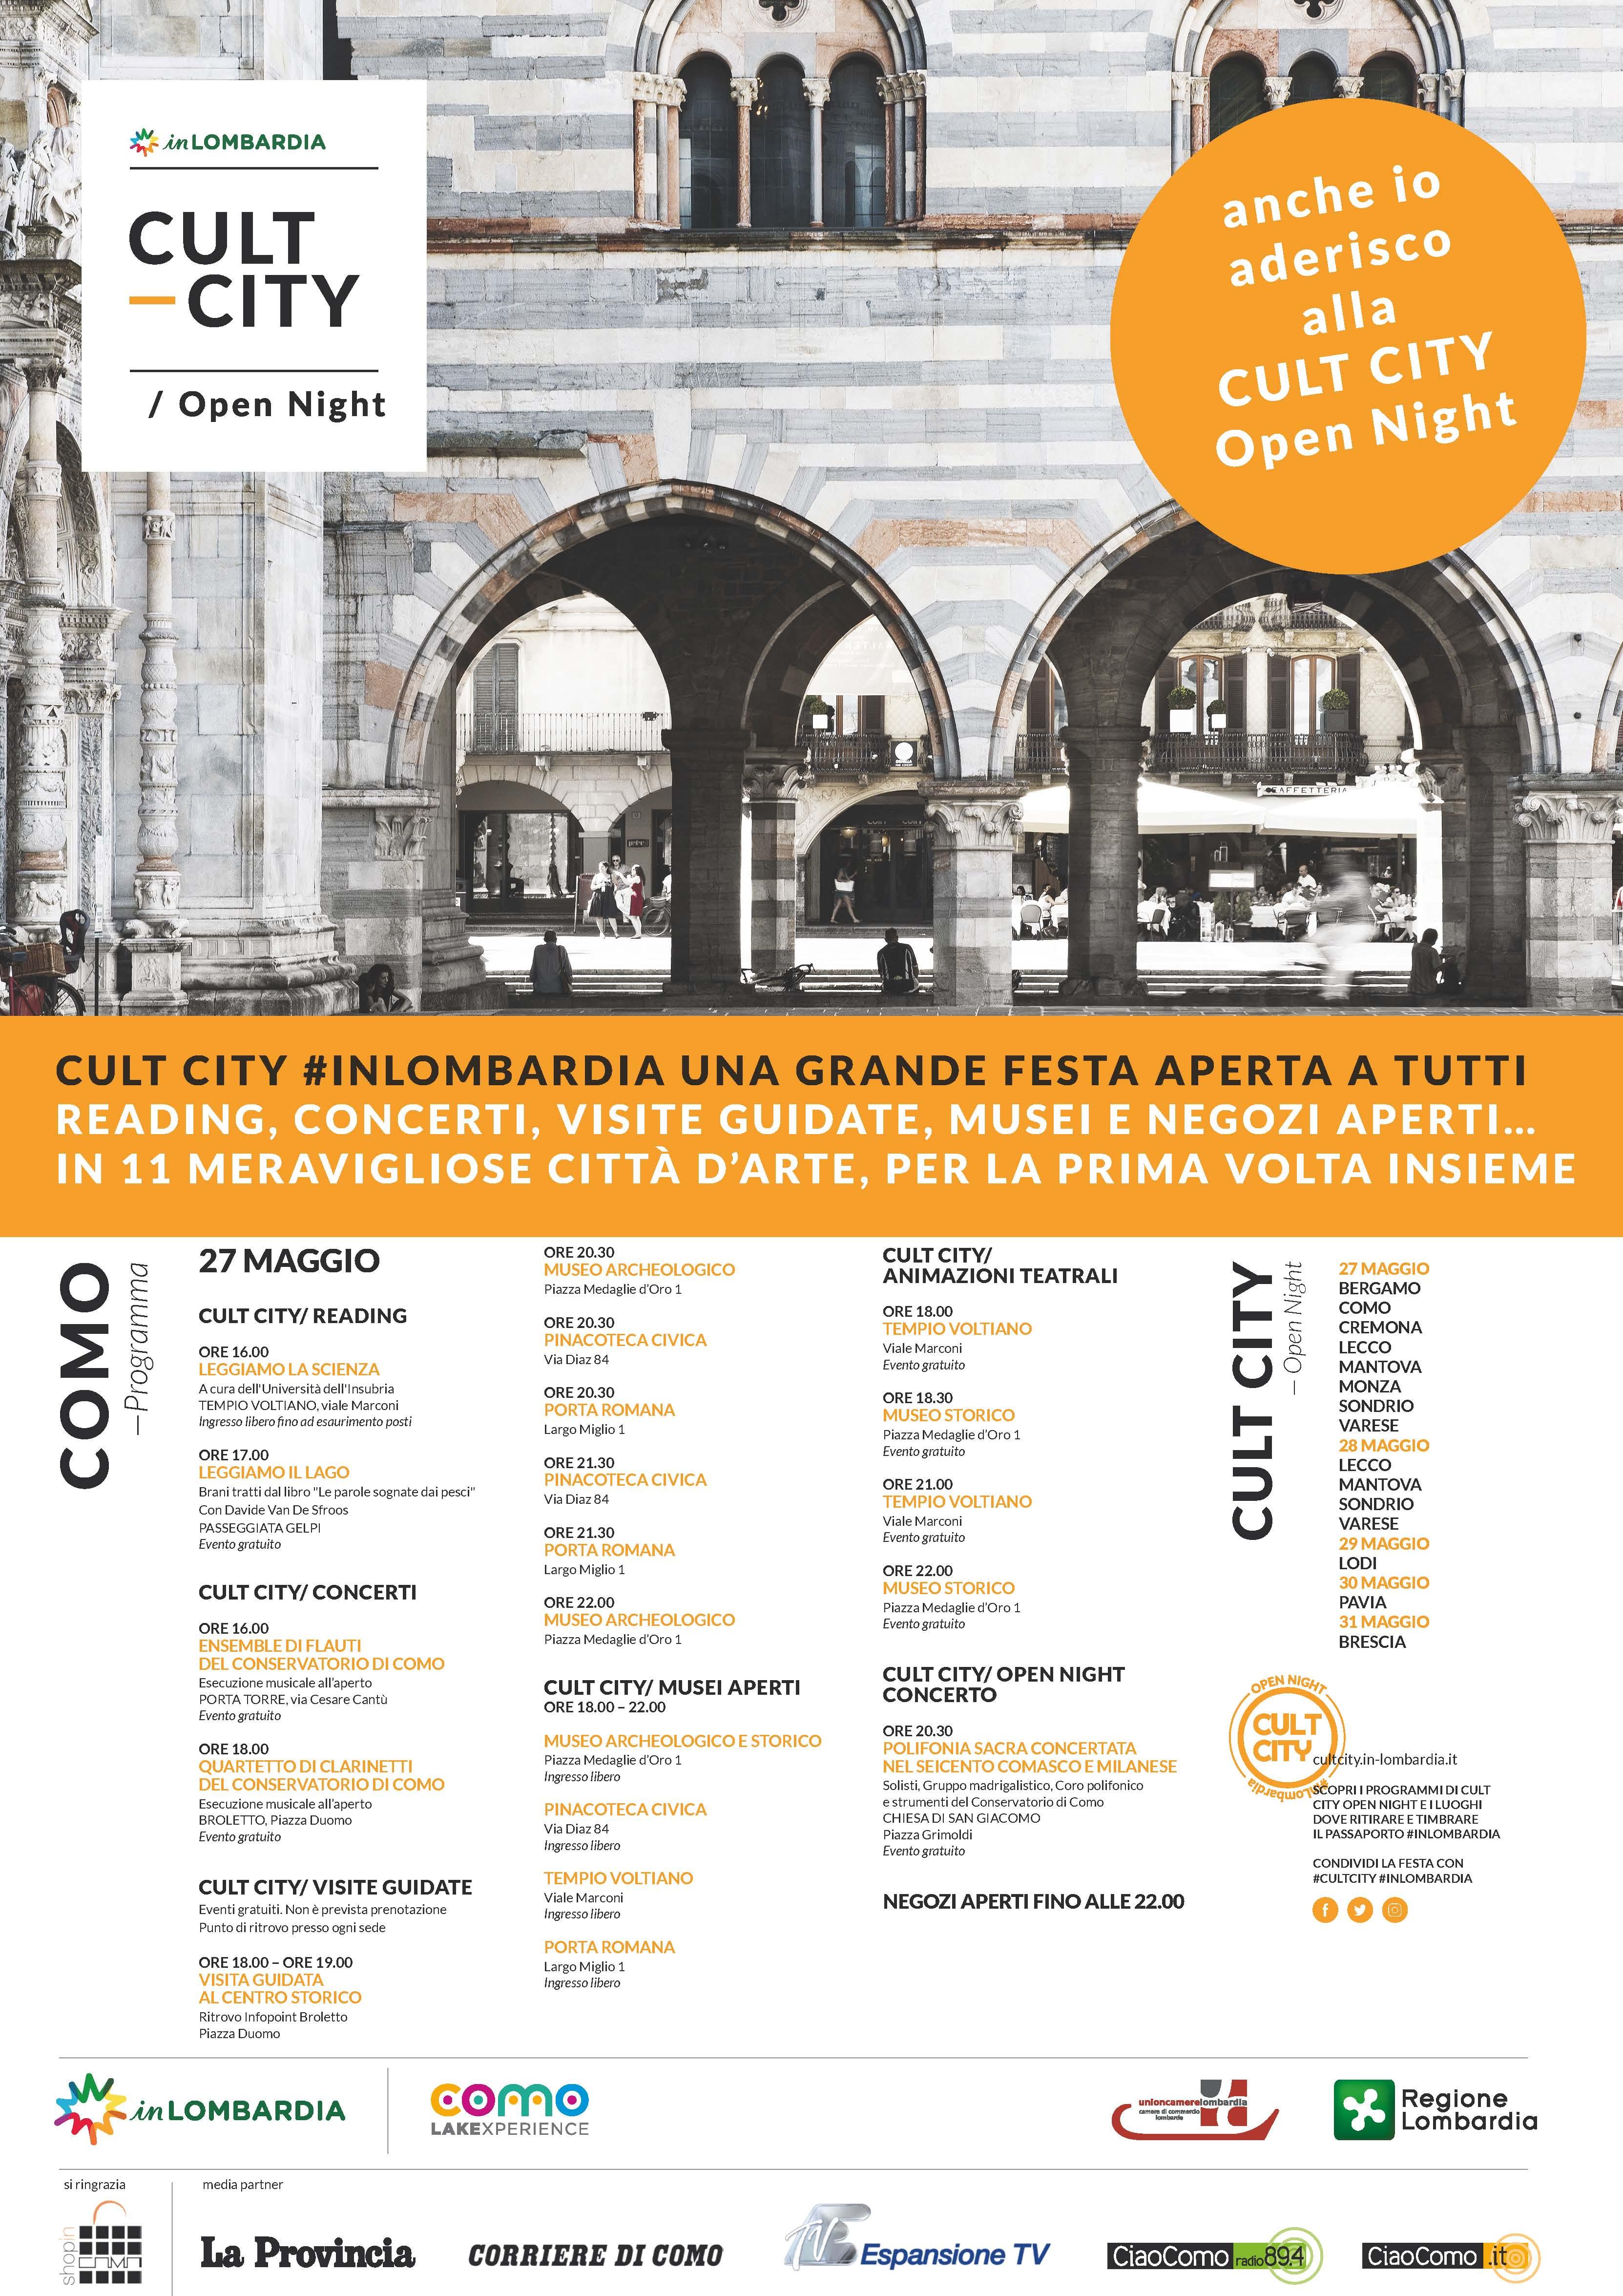 shopincomo; cult city; 27 maggio 2017; aperture serali como; shopping a como